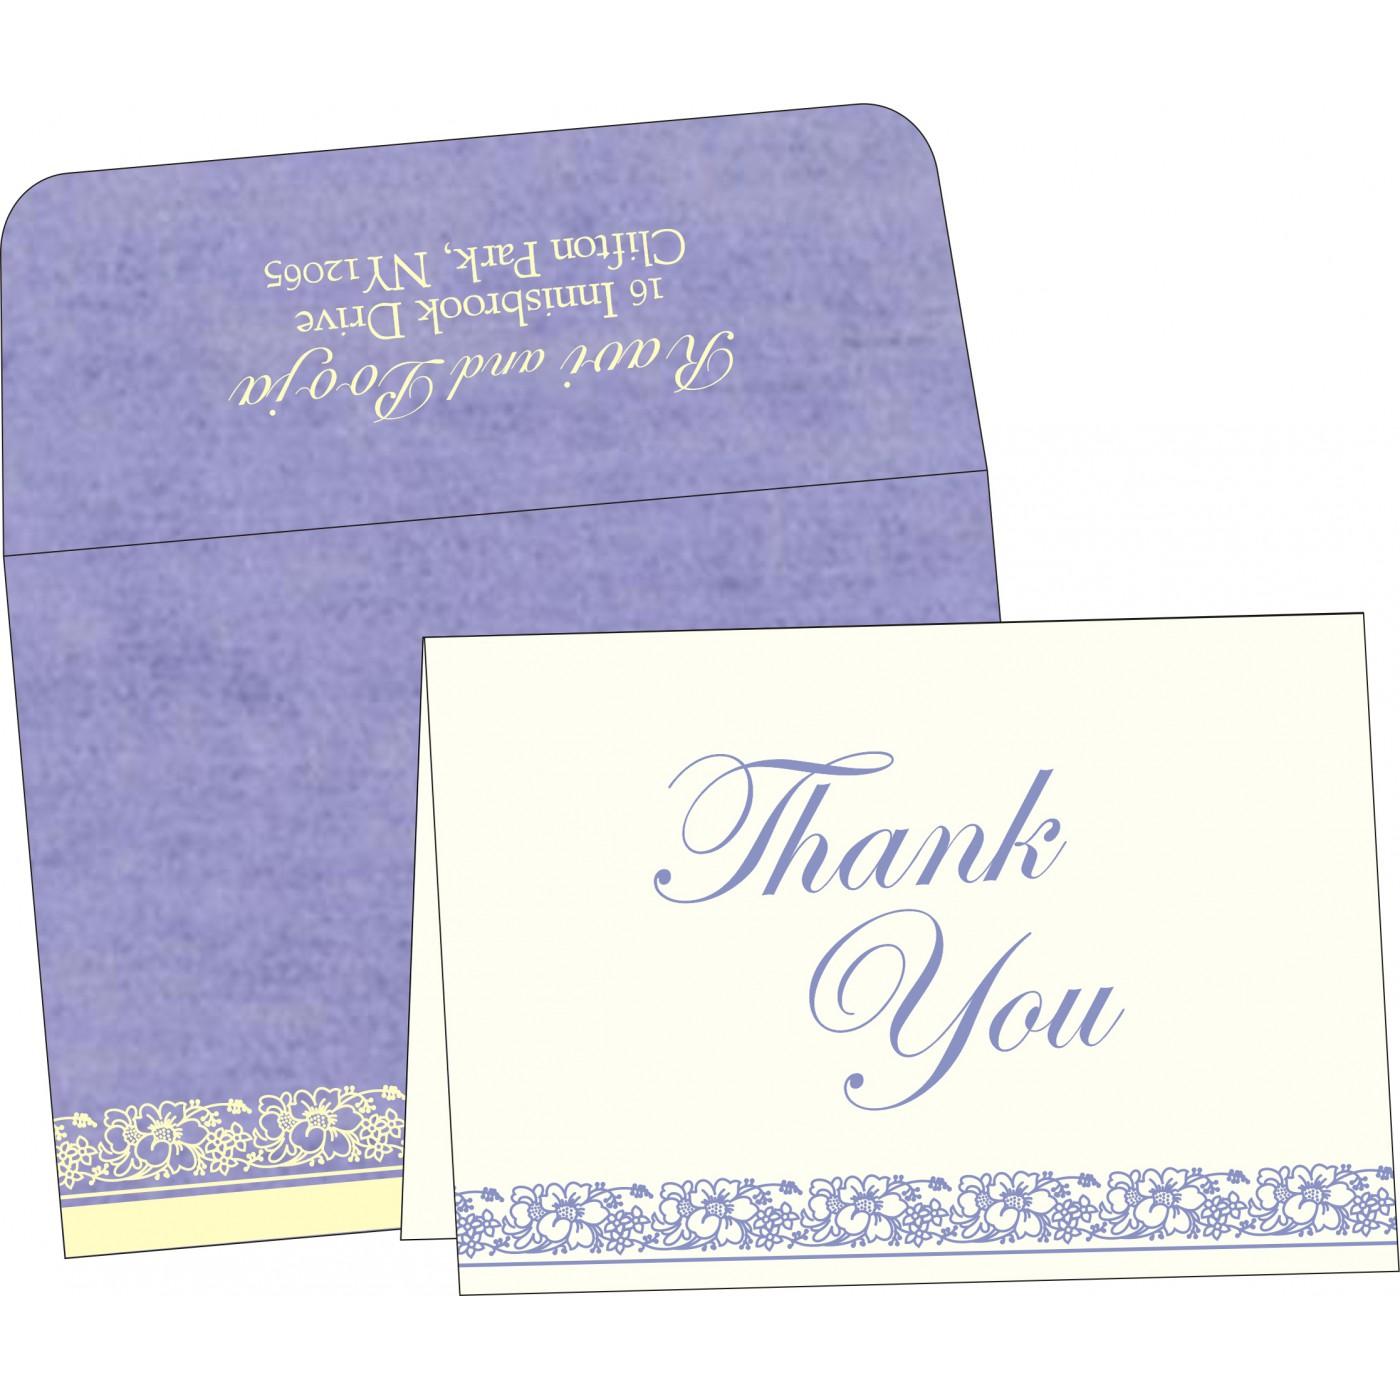 Thank You Cards : TYC-8207D - 123WeddingCards